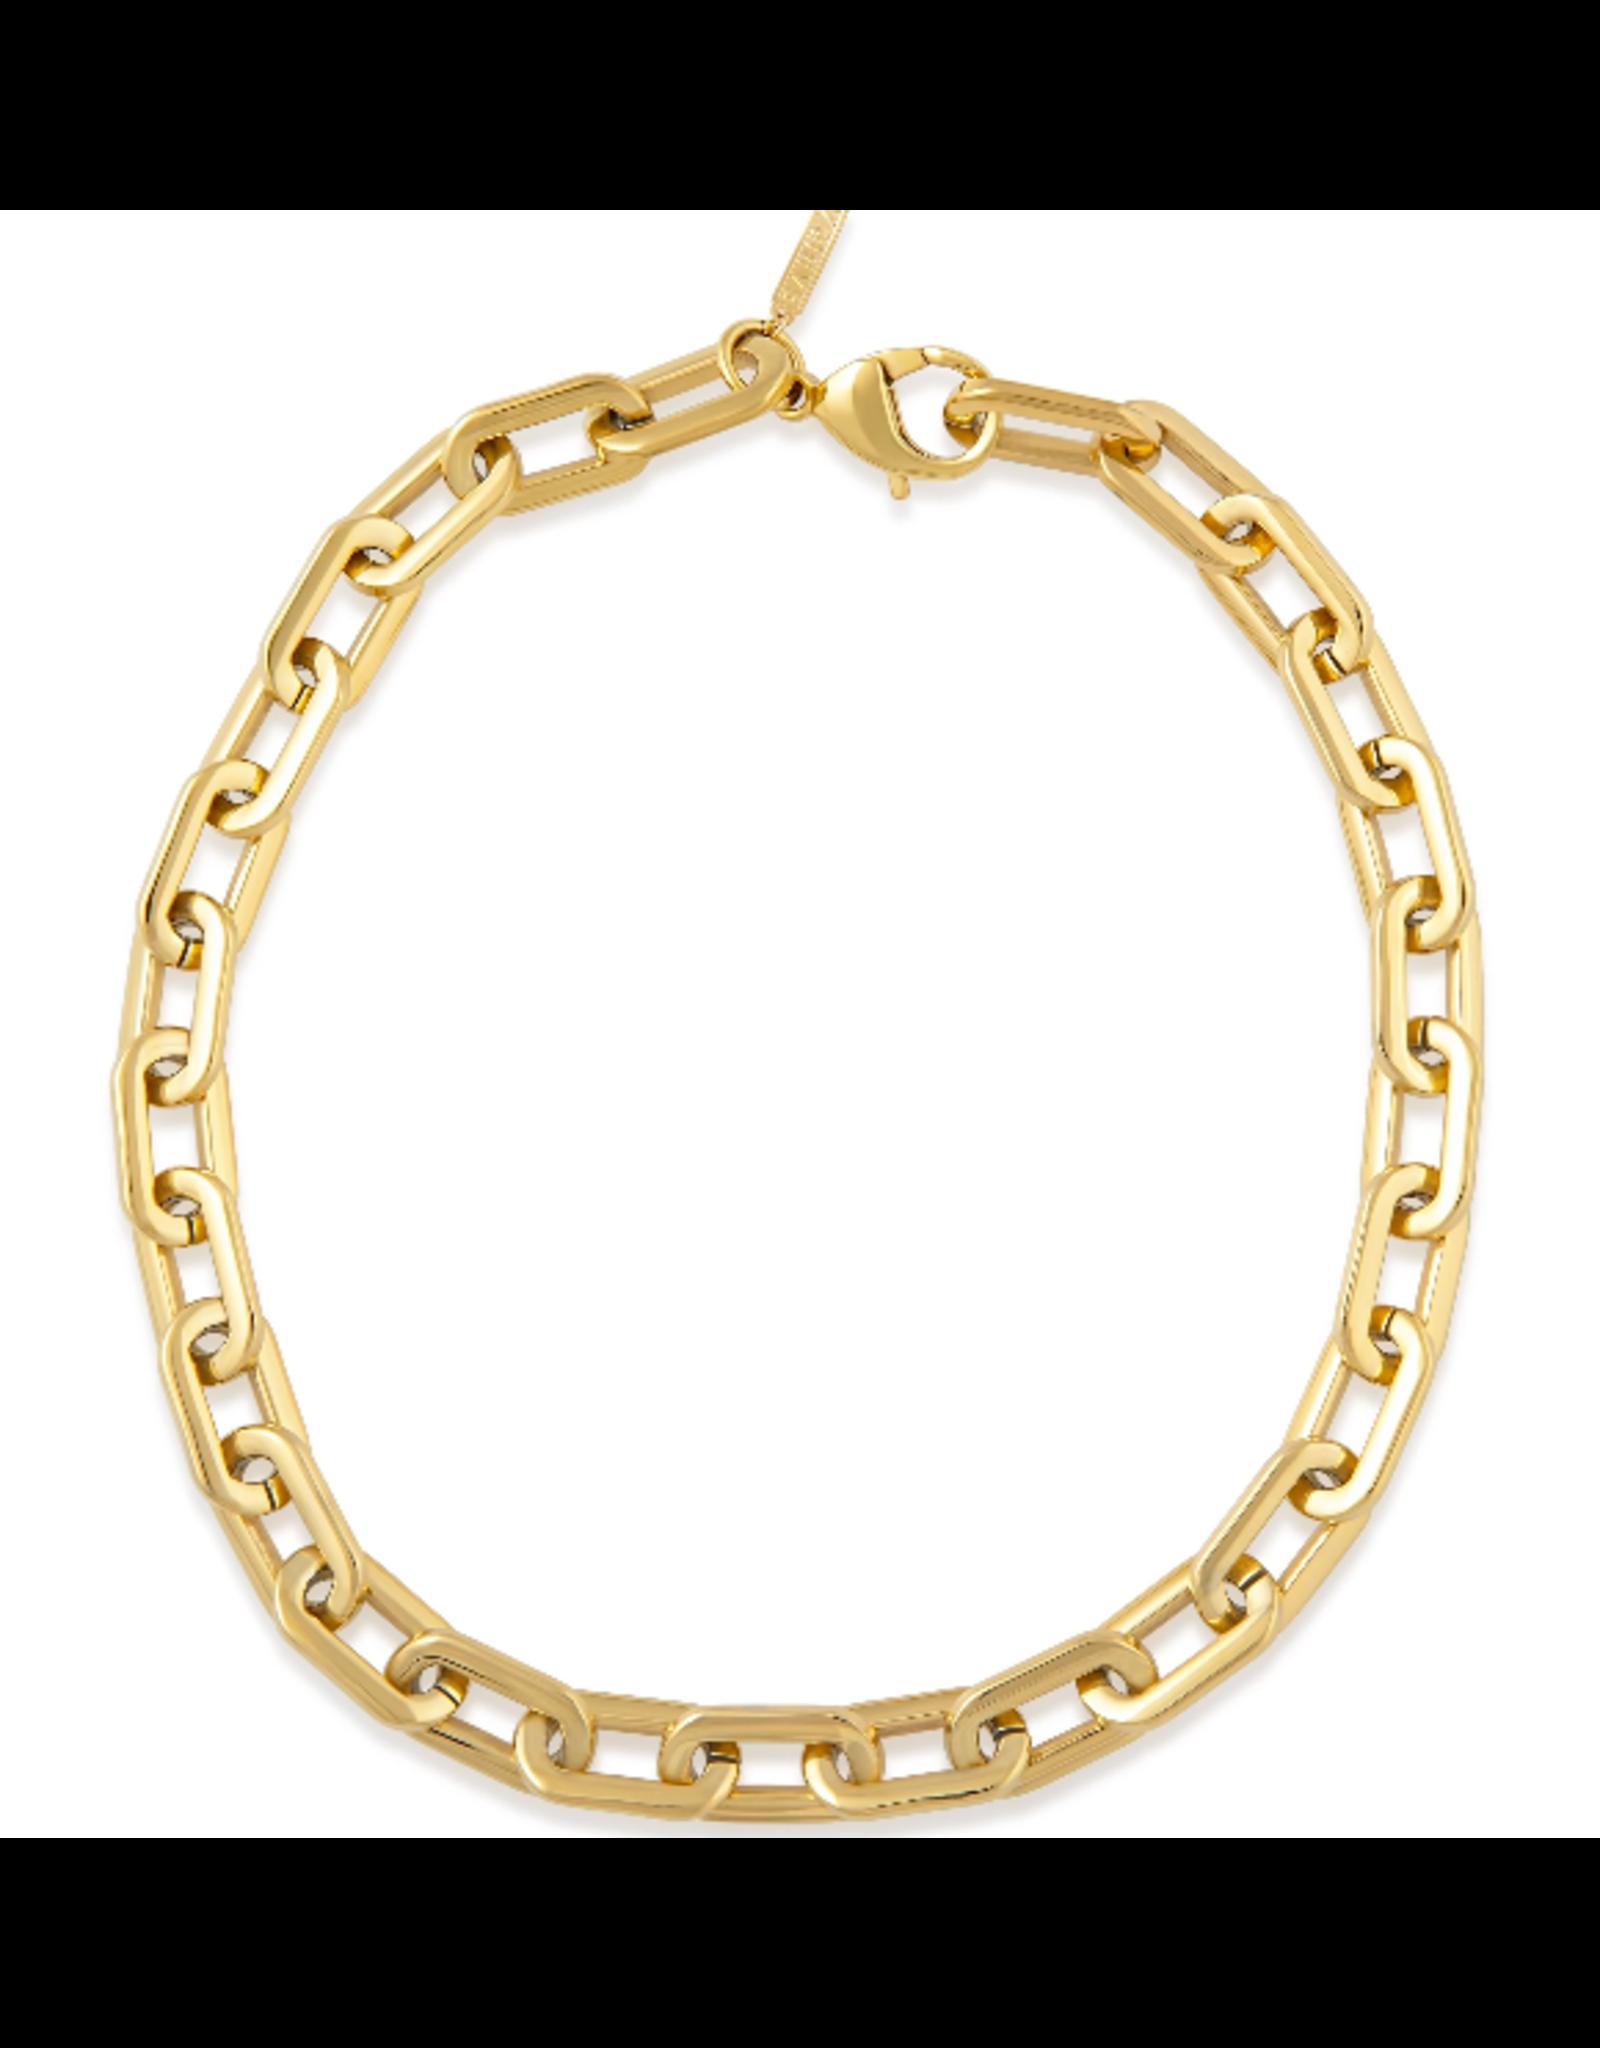 Sahira Jewelry Jenna Link Necklace in Gold